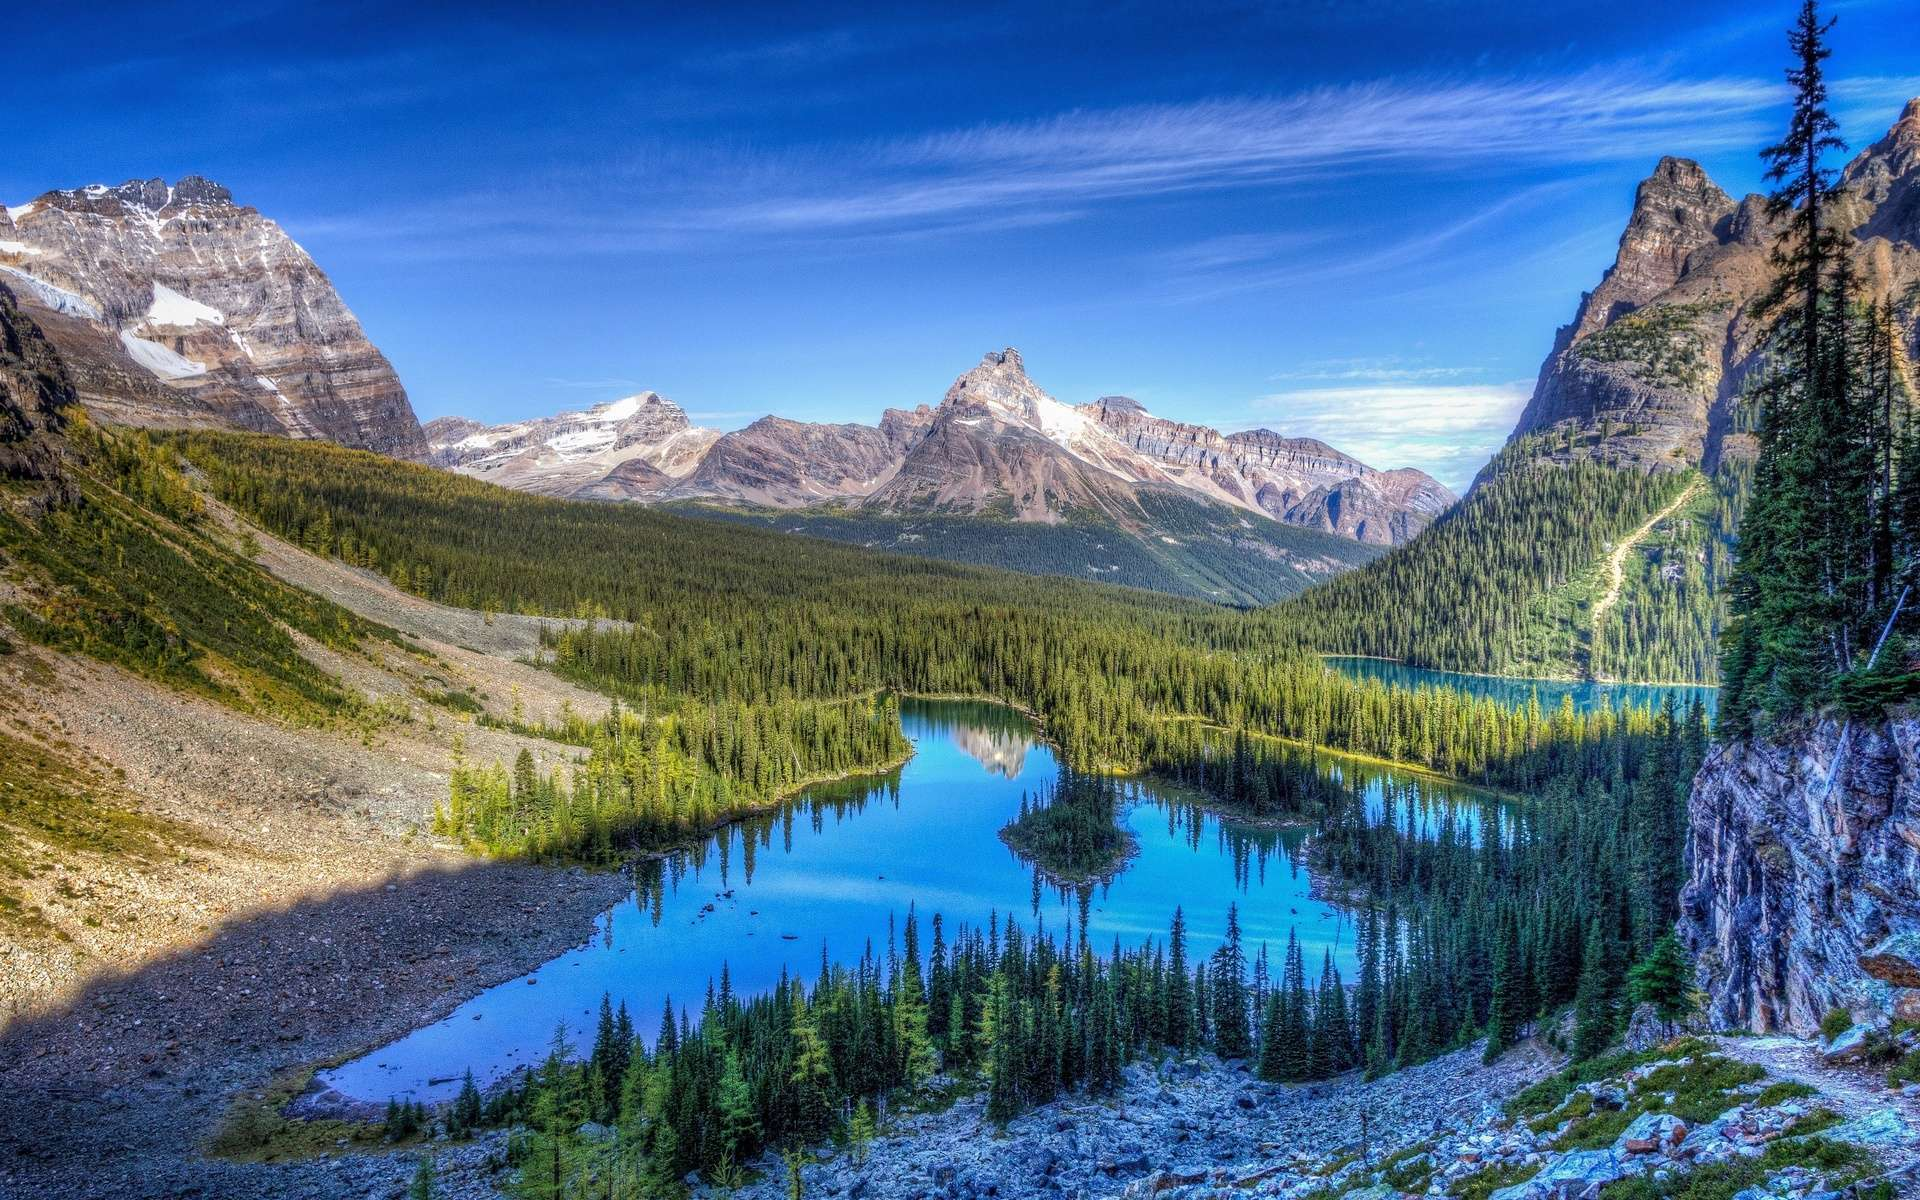 Colorado Mountains Desktop Wallpaper - WallpaperSafari